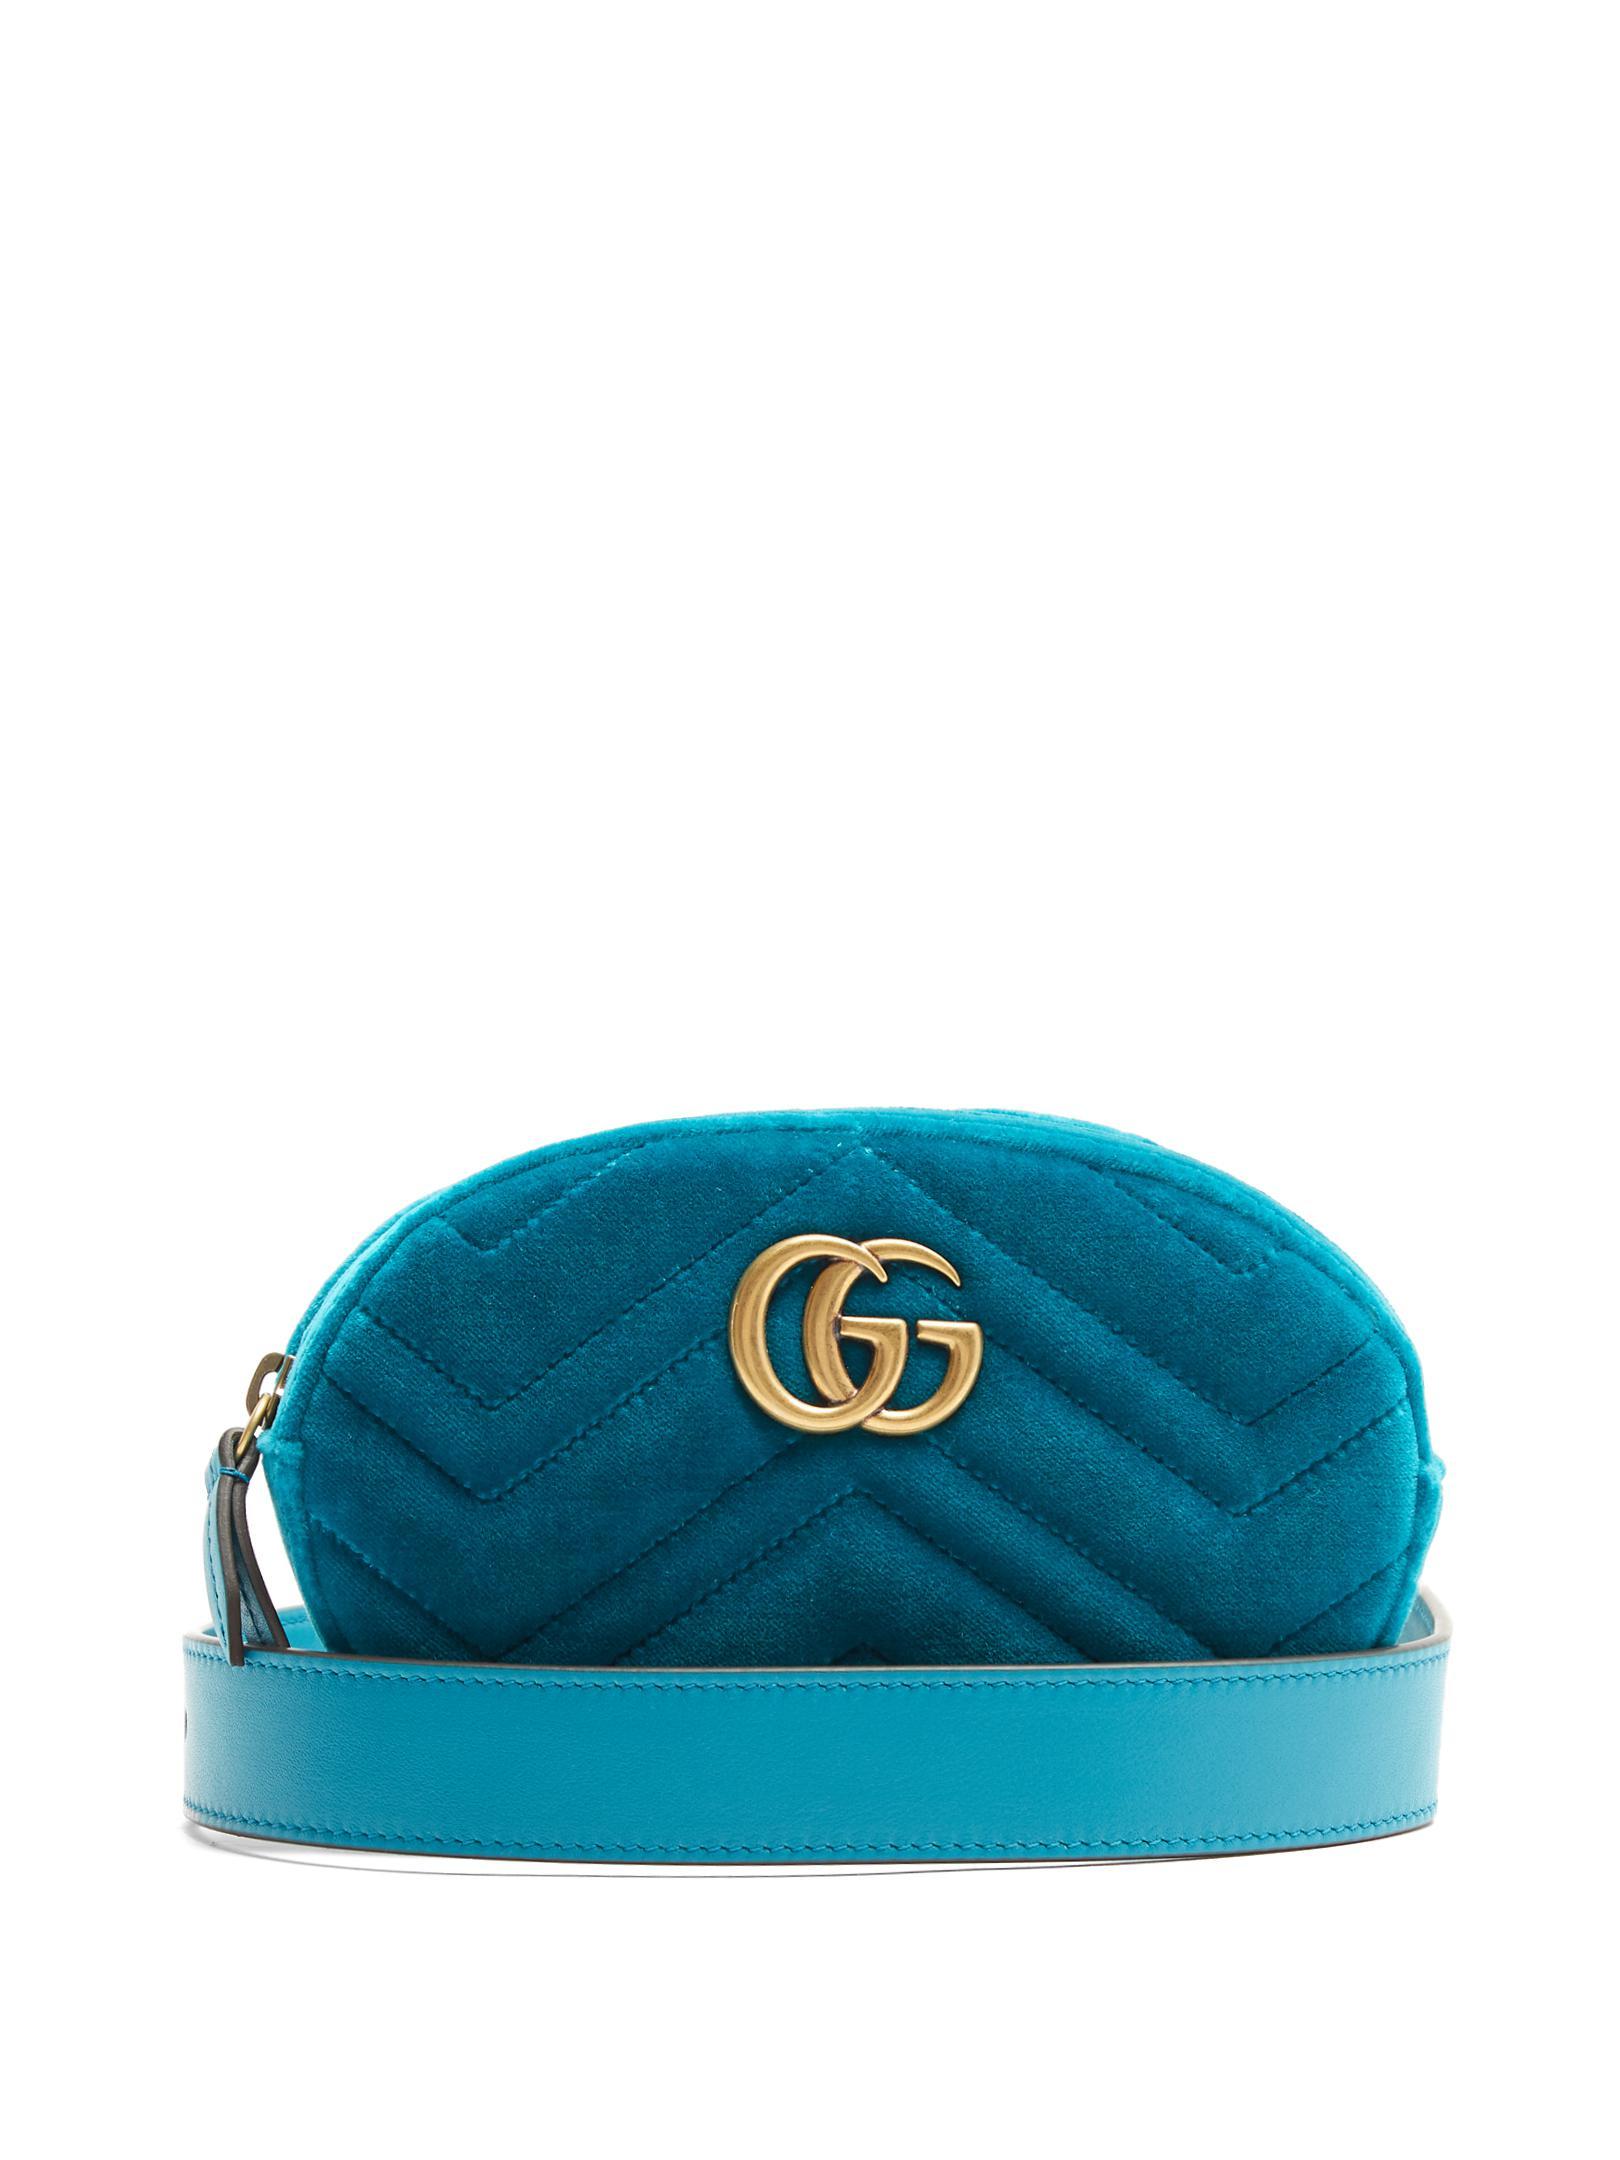 f2c7b994cb4d76 Gucci Belt Bag Velvet Blue | Stanford Center for Opportunity Policy ...